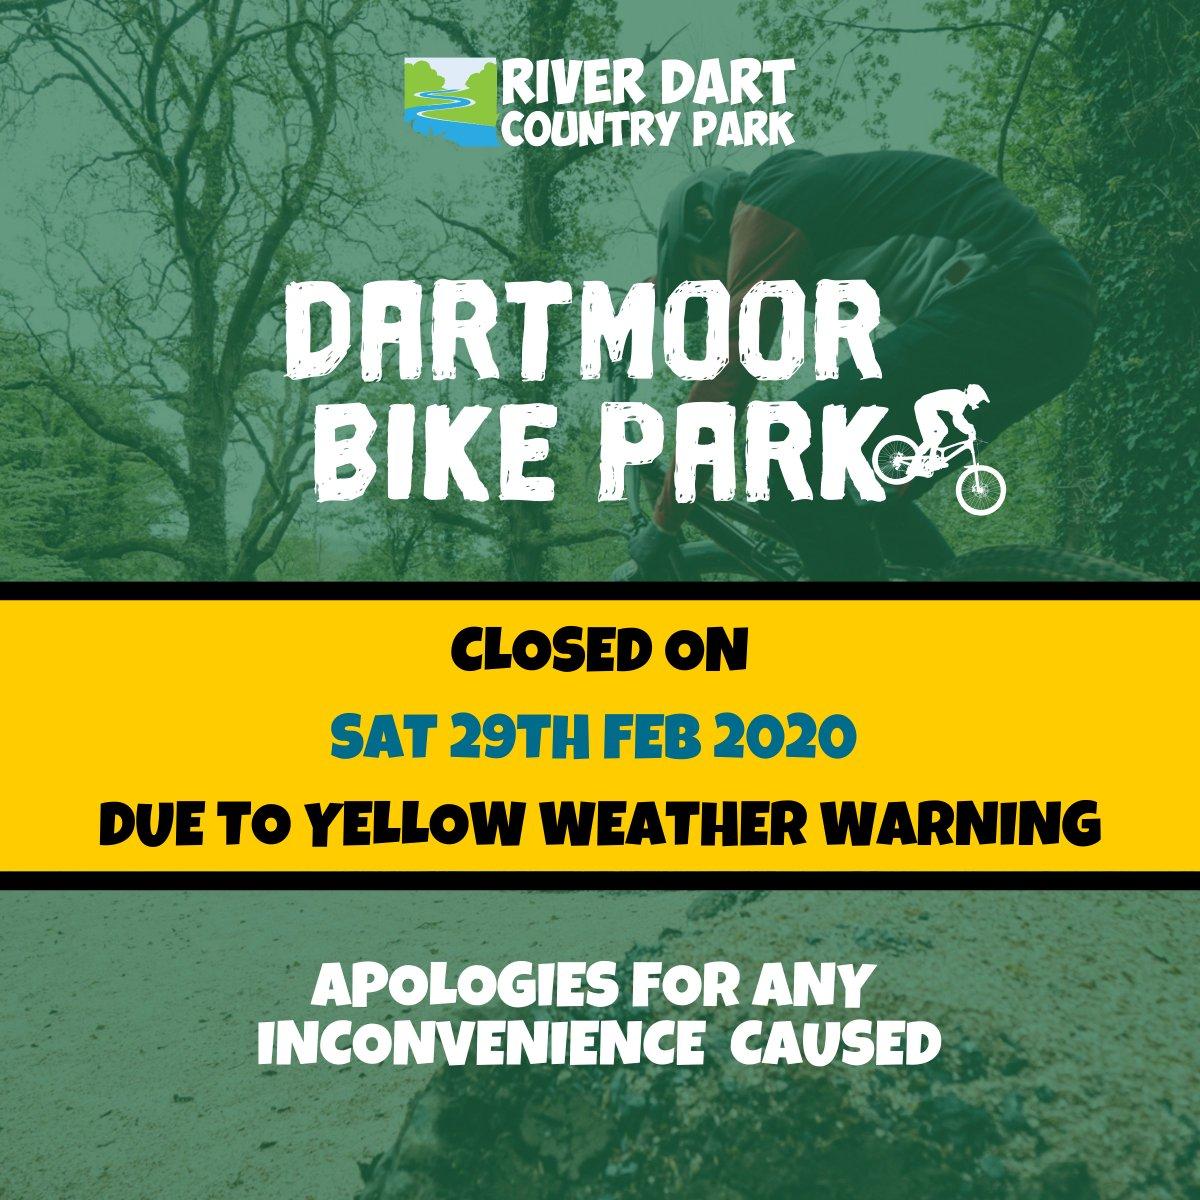 **WEATHER WARNING - DARTMOOR BIKE PARK CLOSURE NOTICE** Dartmoor Bike Park will be closed on Sat 29th February due to yellow weather warning.